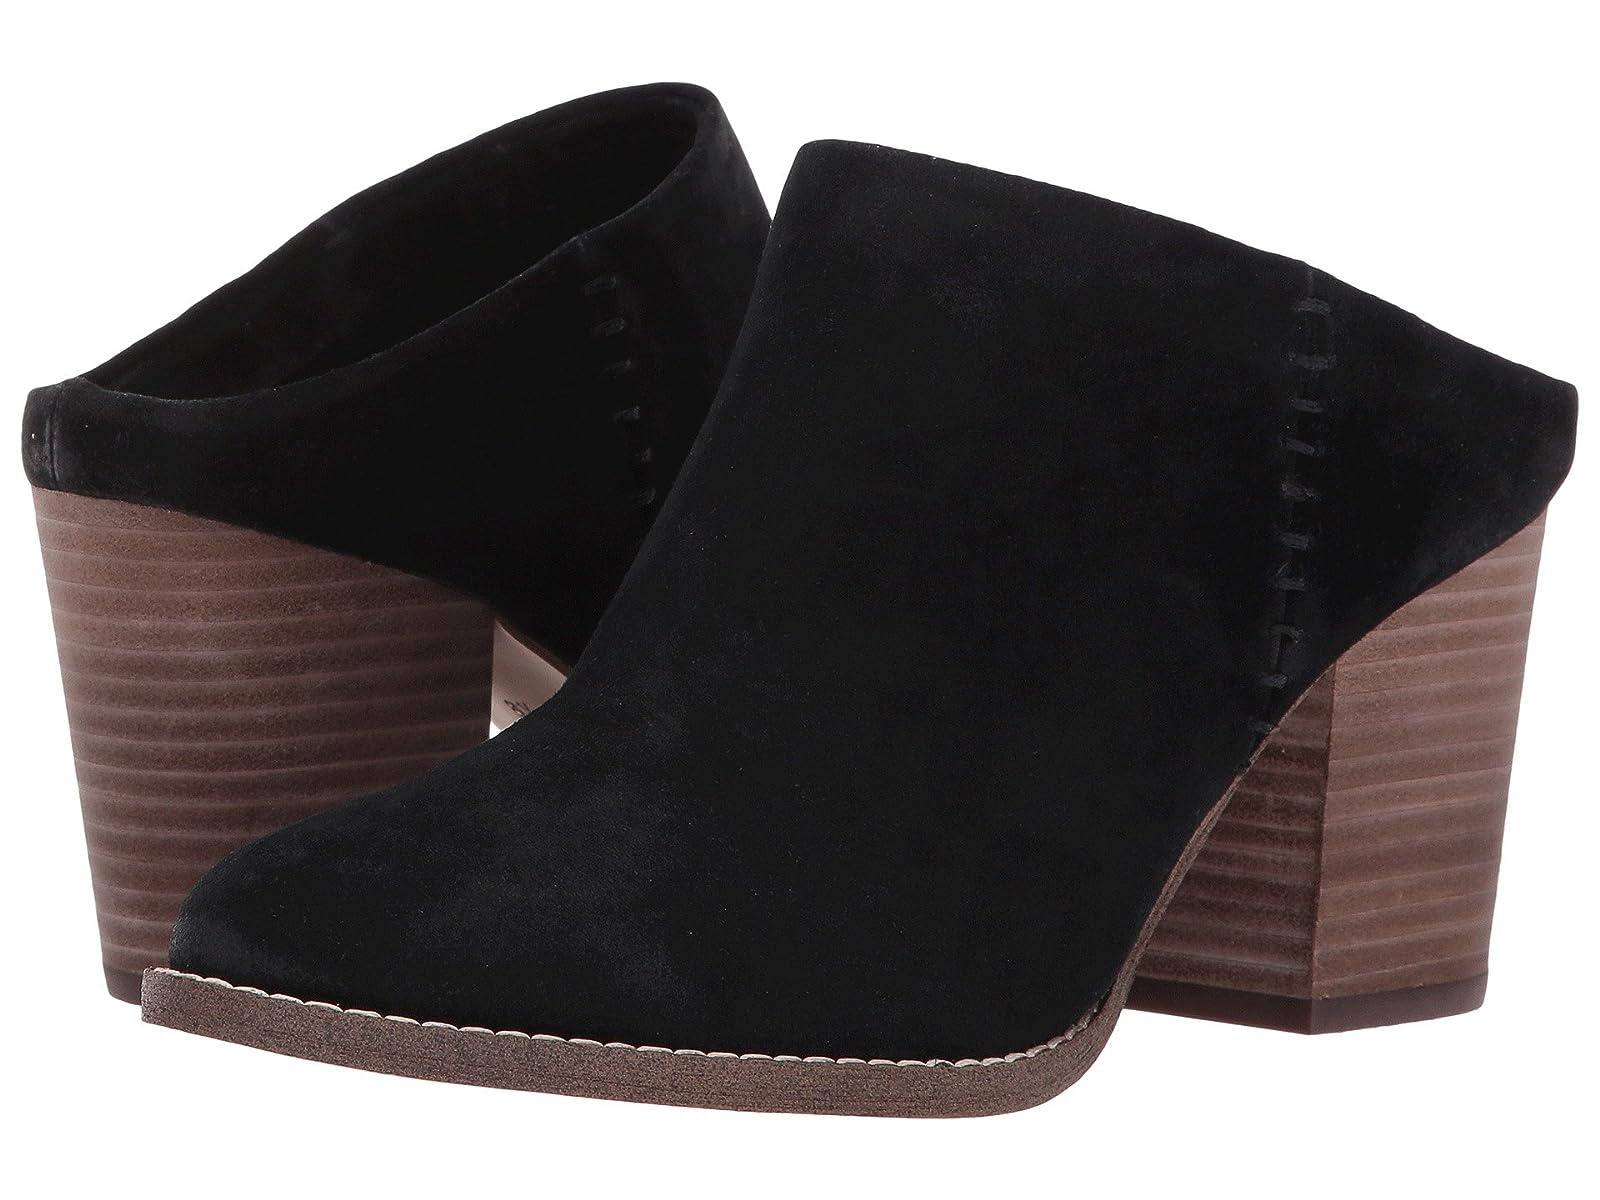 Splendid DebrahCheap and distinctive eye-catching shoes